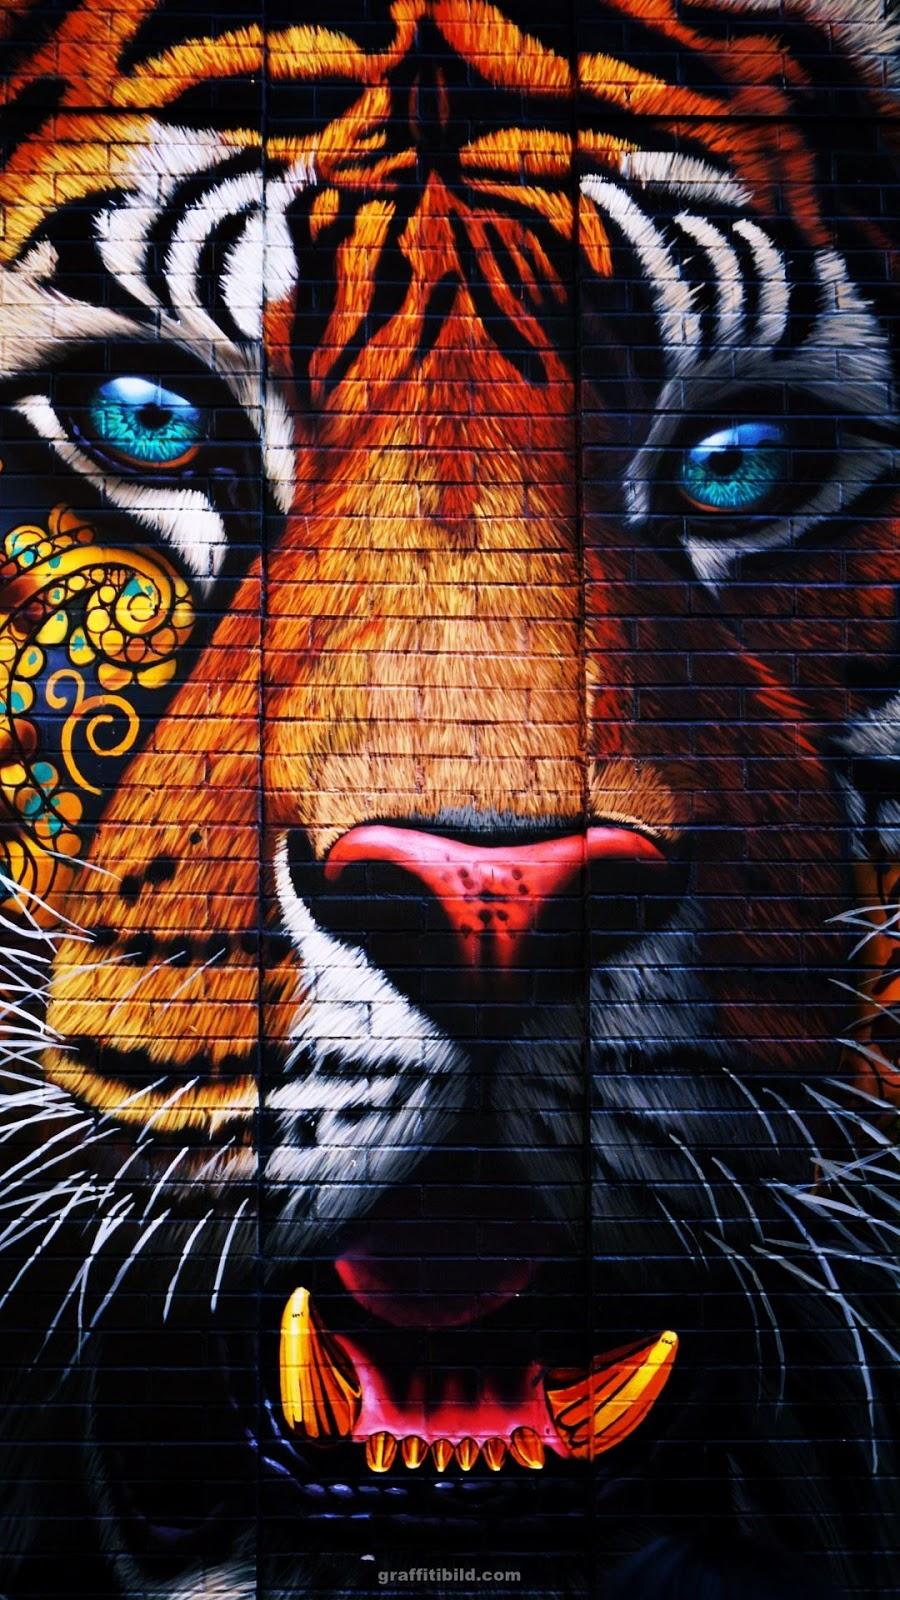 street art bilder, wallpapers, mobile, android, iphone